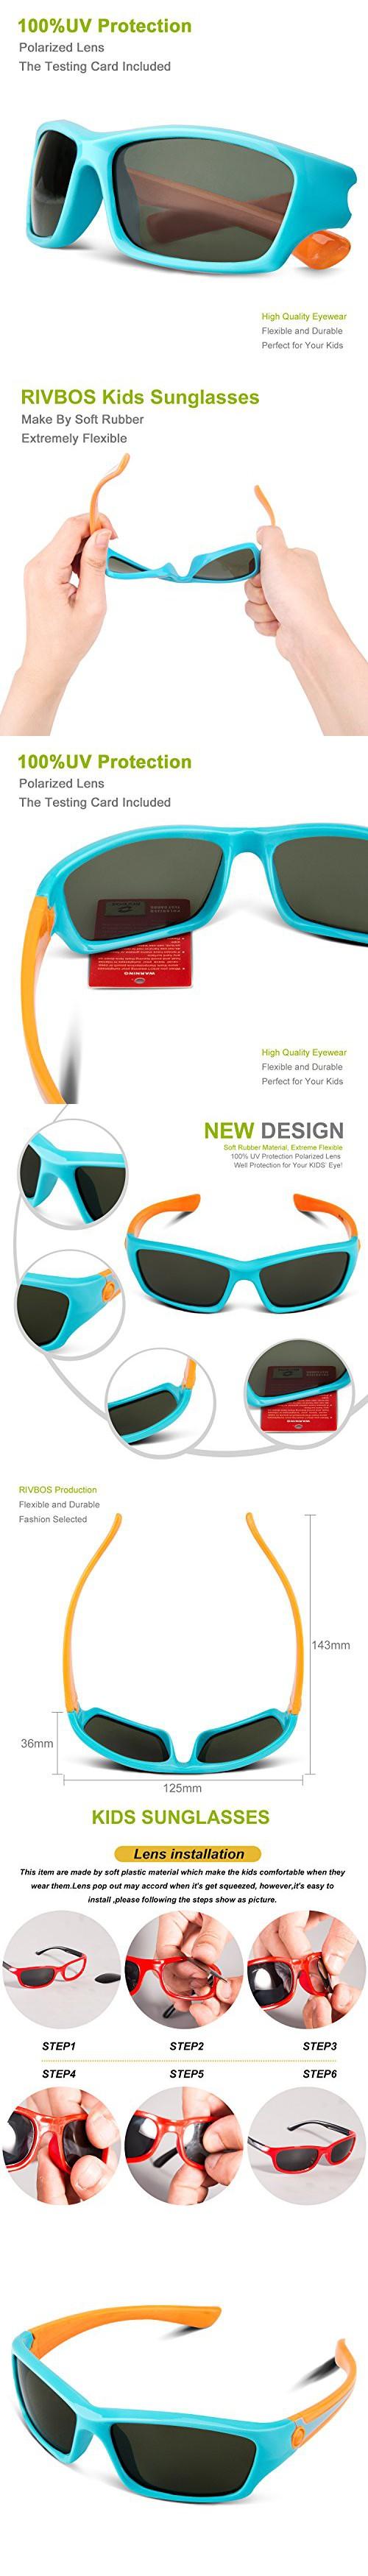 354bee28ed1 RIVBOS RBK025 Rubber Flexible Kids Polarized Sunglasses Glasses Age 3-10  (Blue)